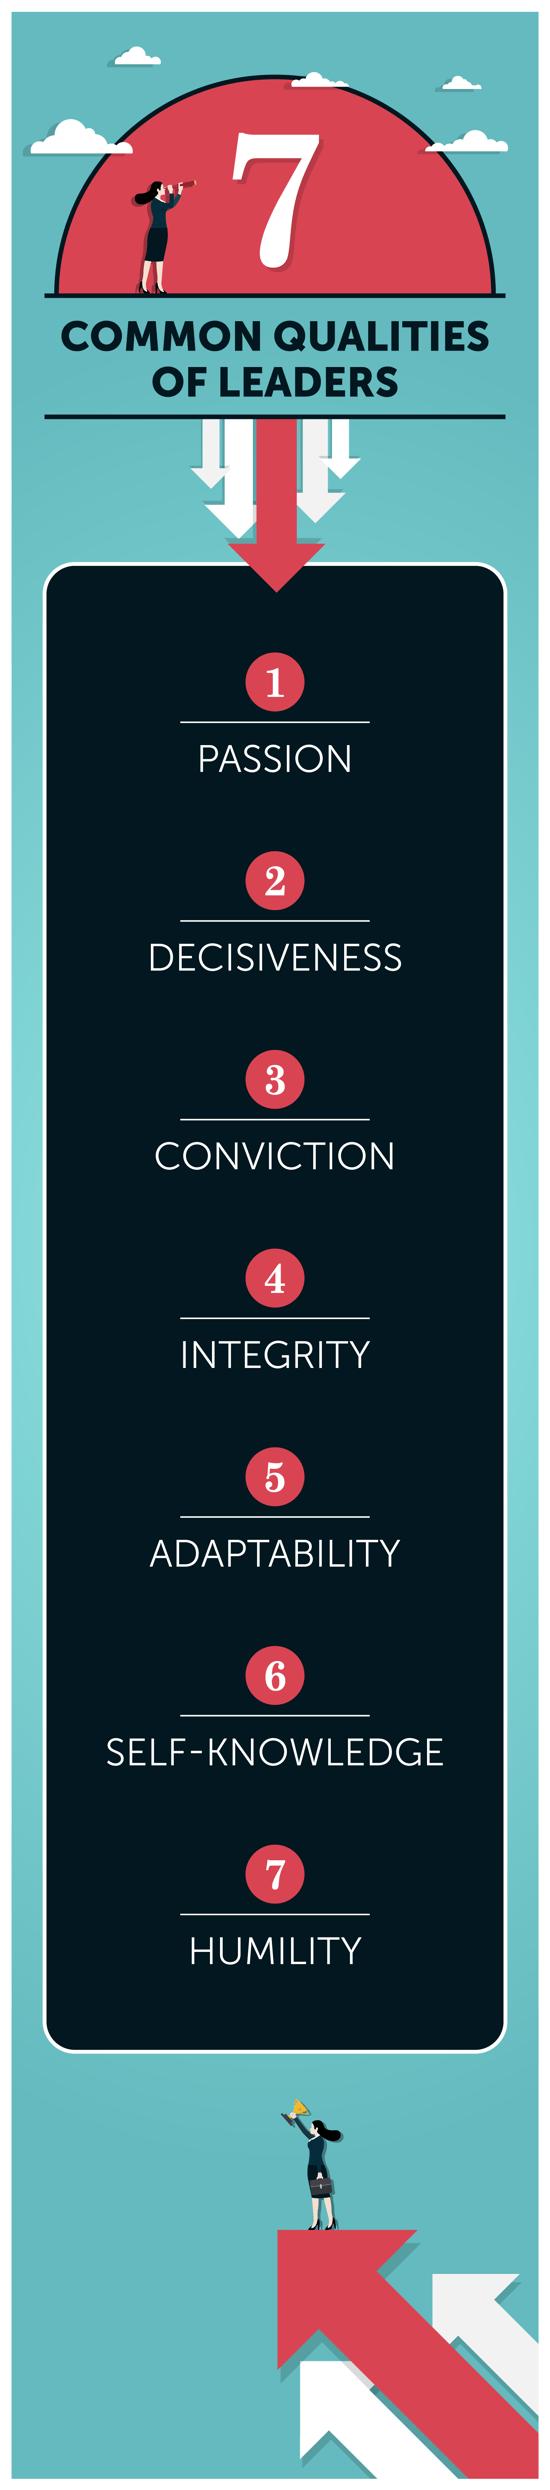 7-Common-Qualities-of-Leaders_2020